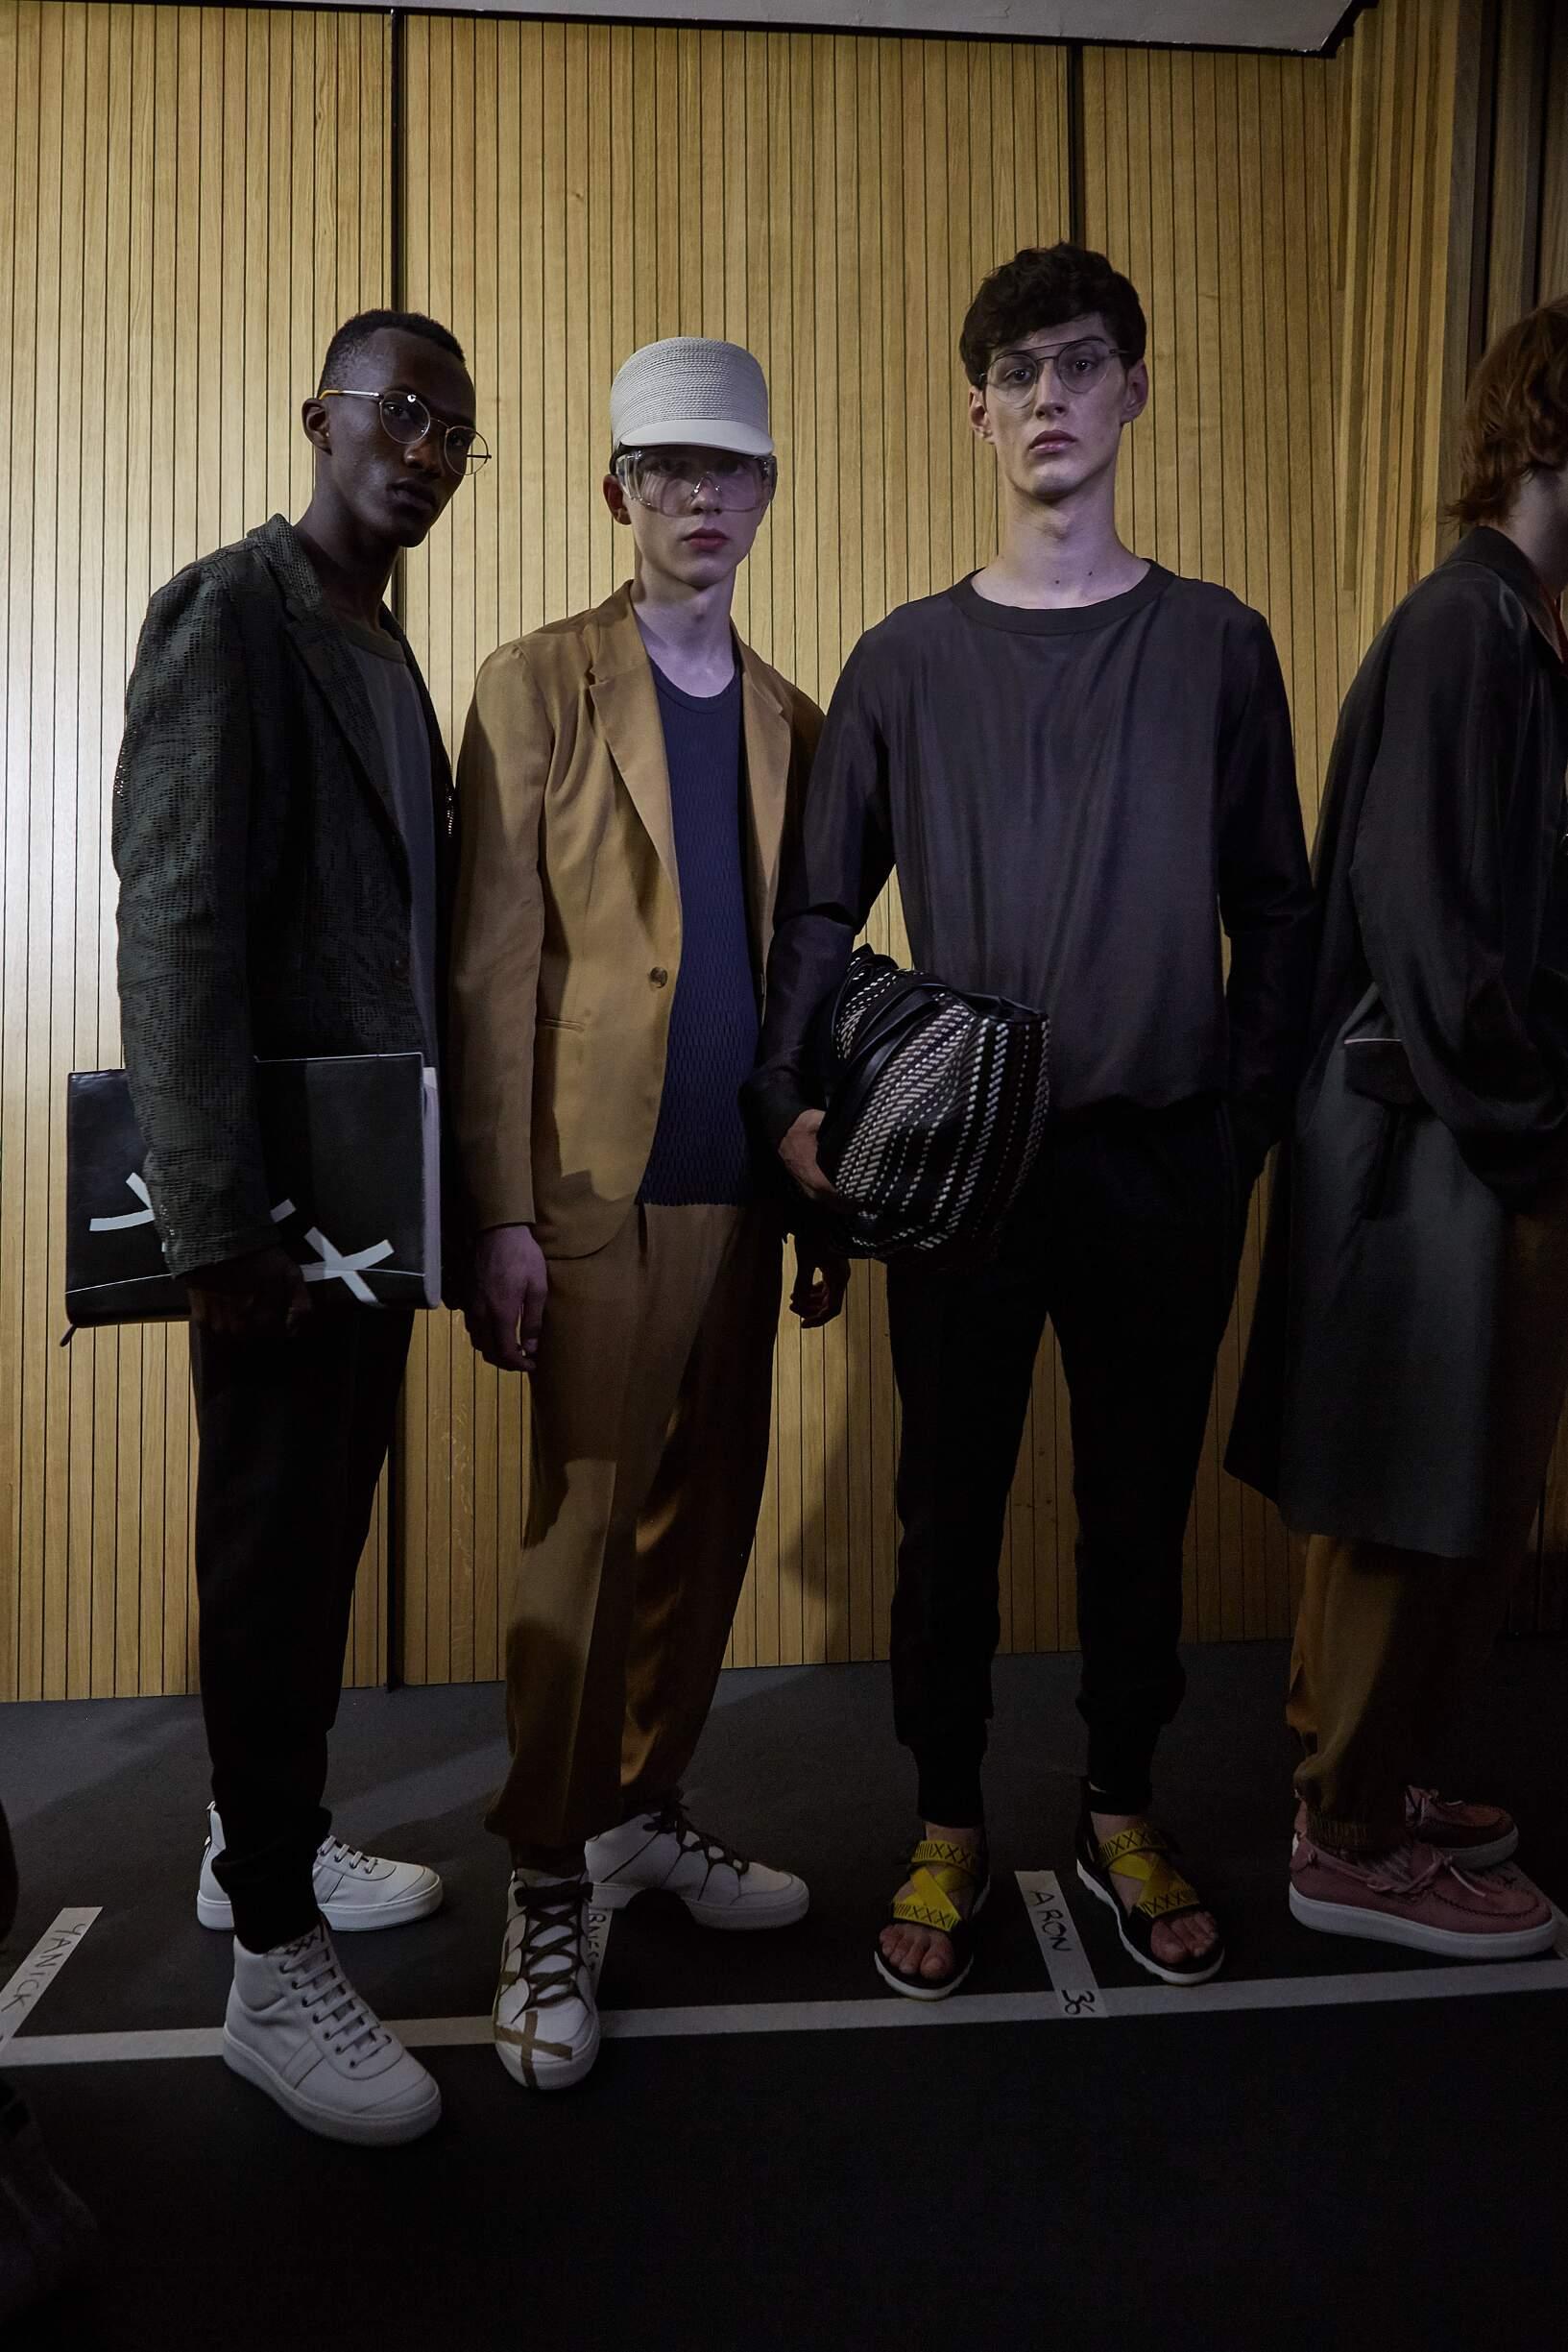 Backstage Ermenegildo Zegna Couture Models Spring 2018 Collection Milan Fashion Week